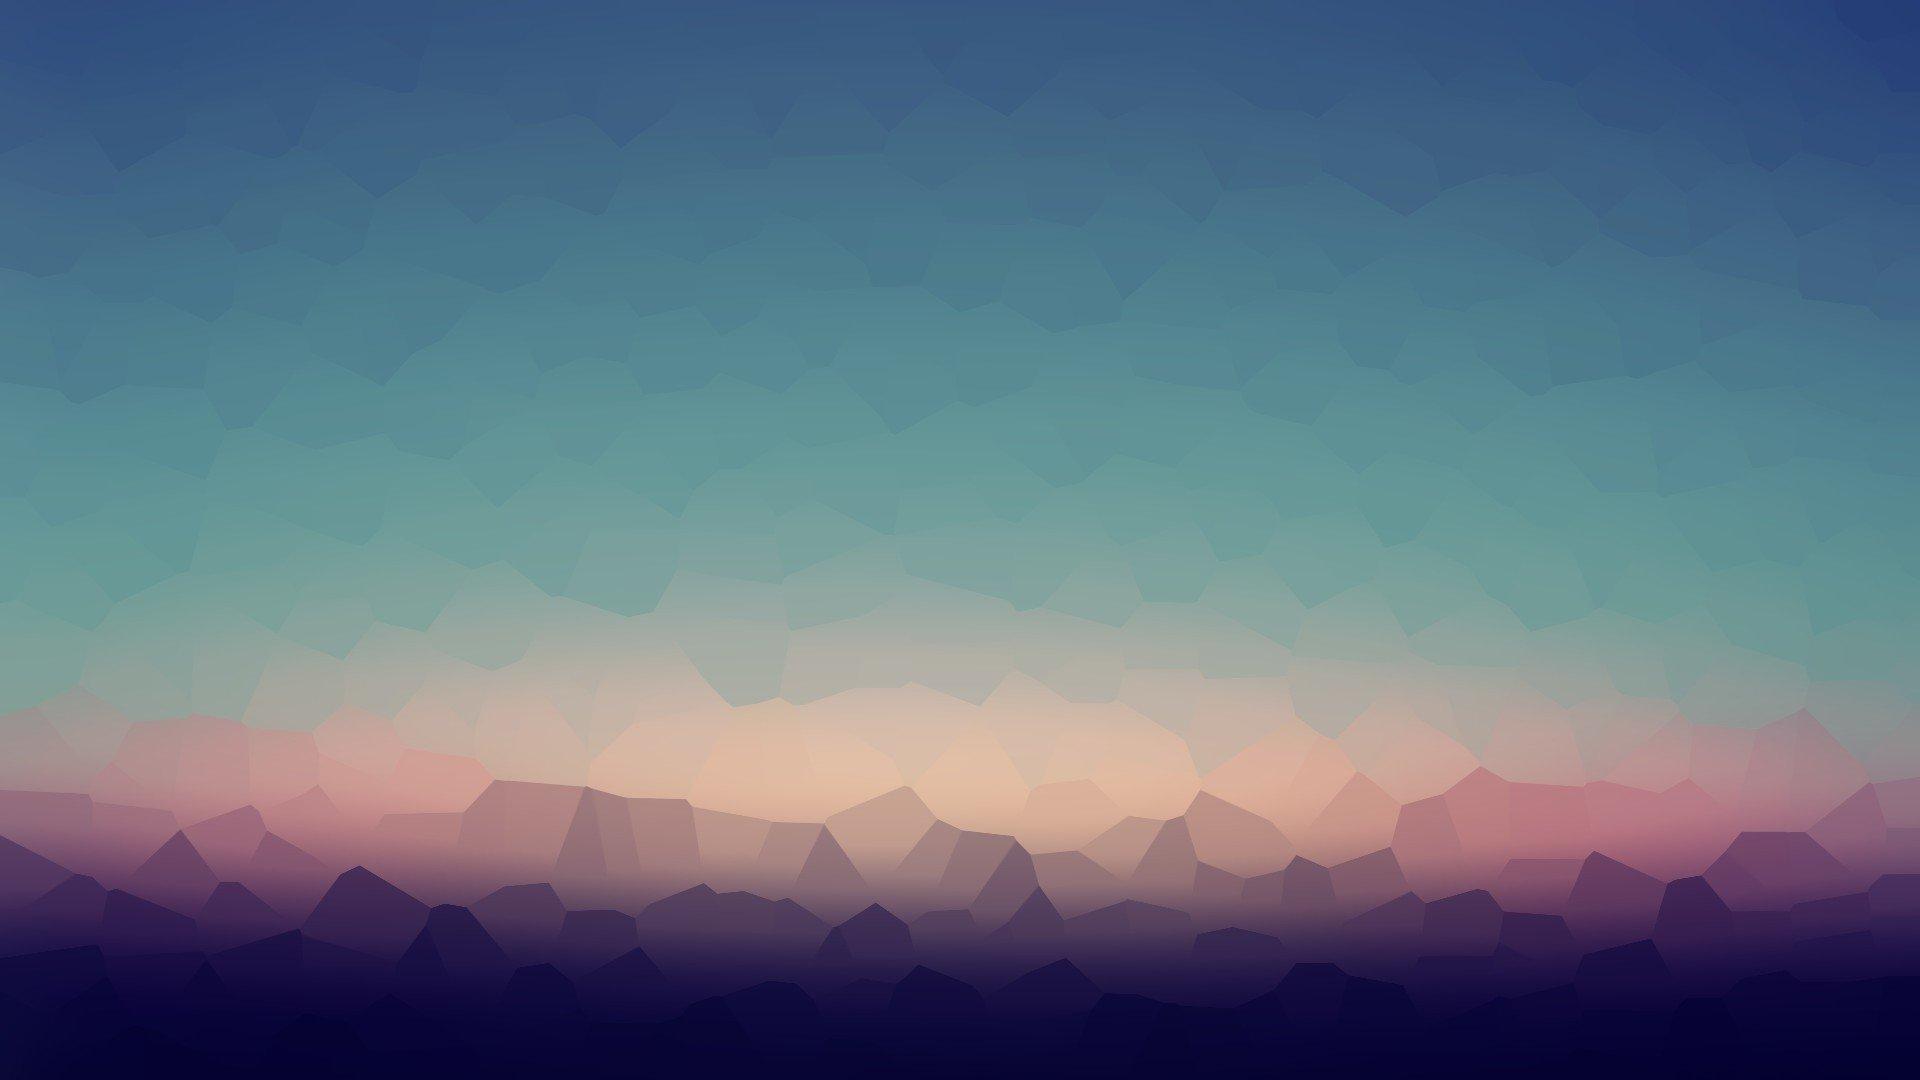 Popular Wallpaper Mountain Polygon - e0b7a05aa7f598ff0d960df2a0f44003  Gallery_803376.jpg